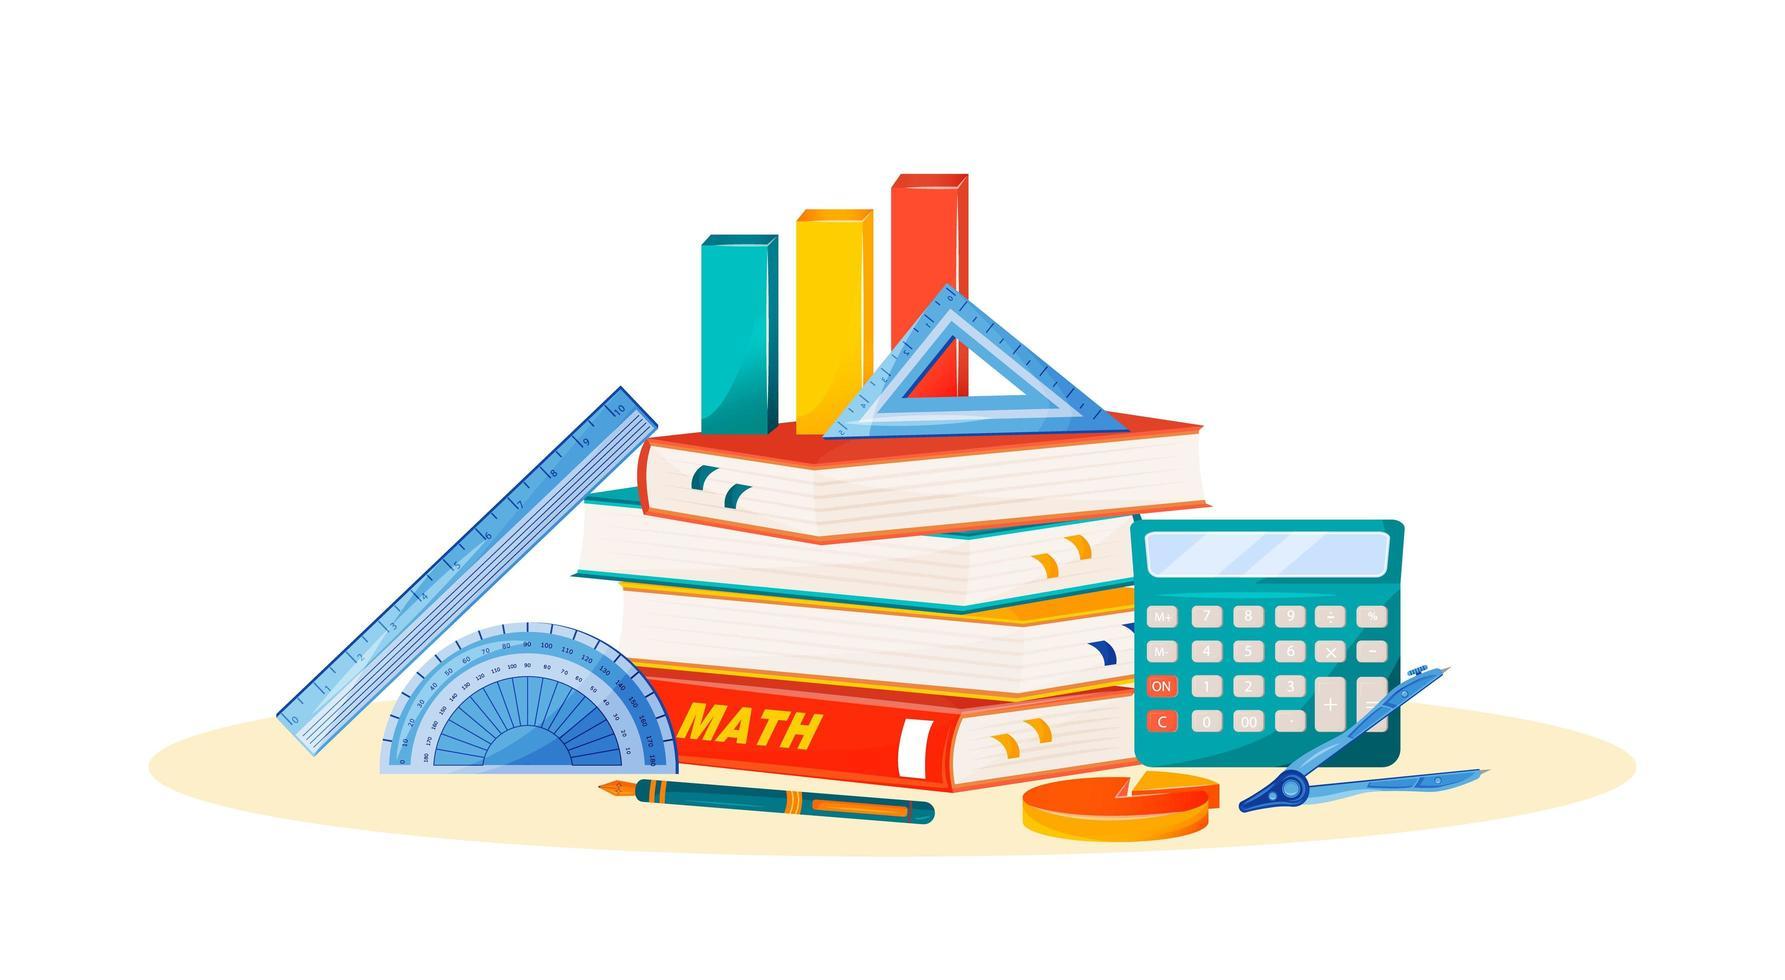 Maths books and supplies vector